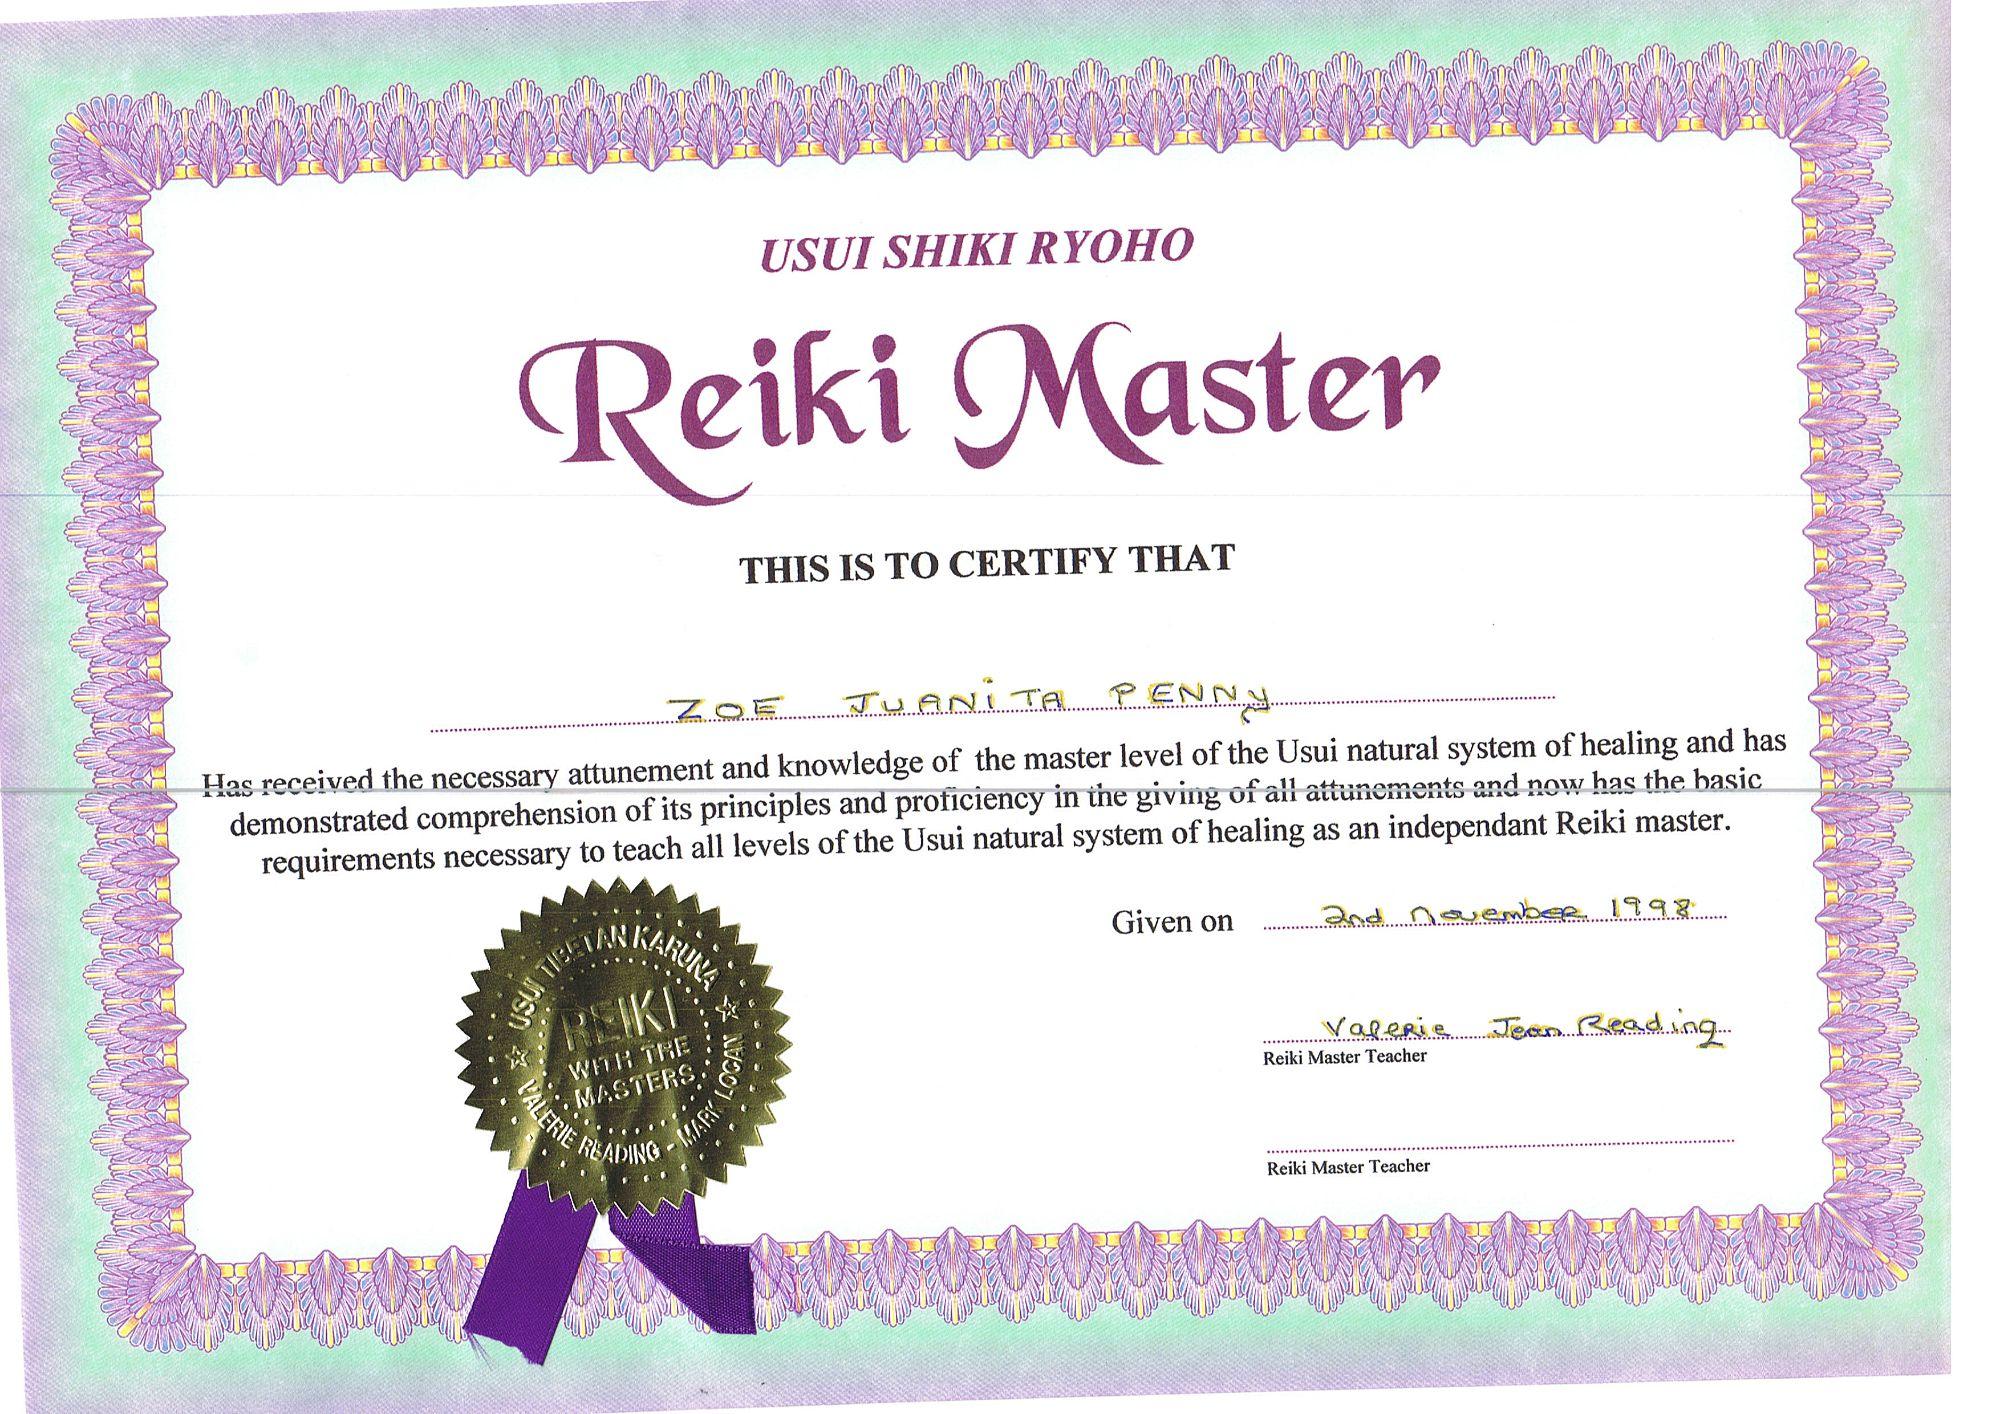 reiki masters (2018_01_22 22_24_22 UTC)